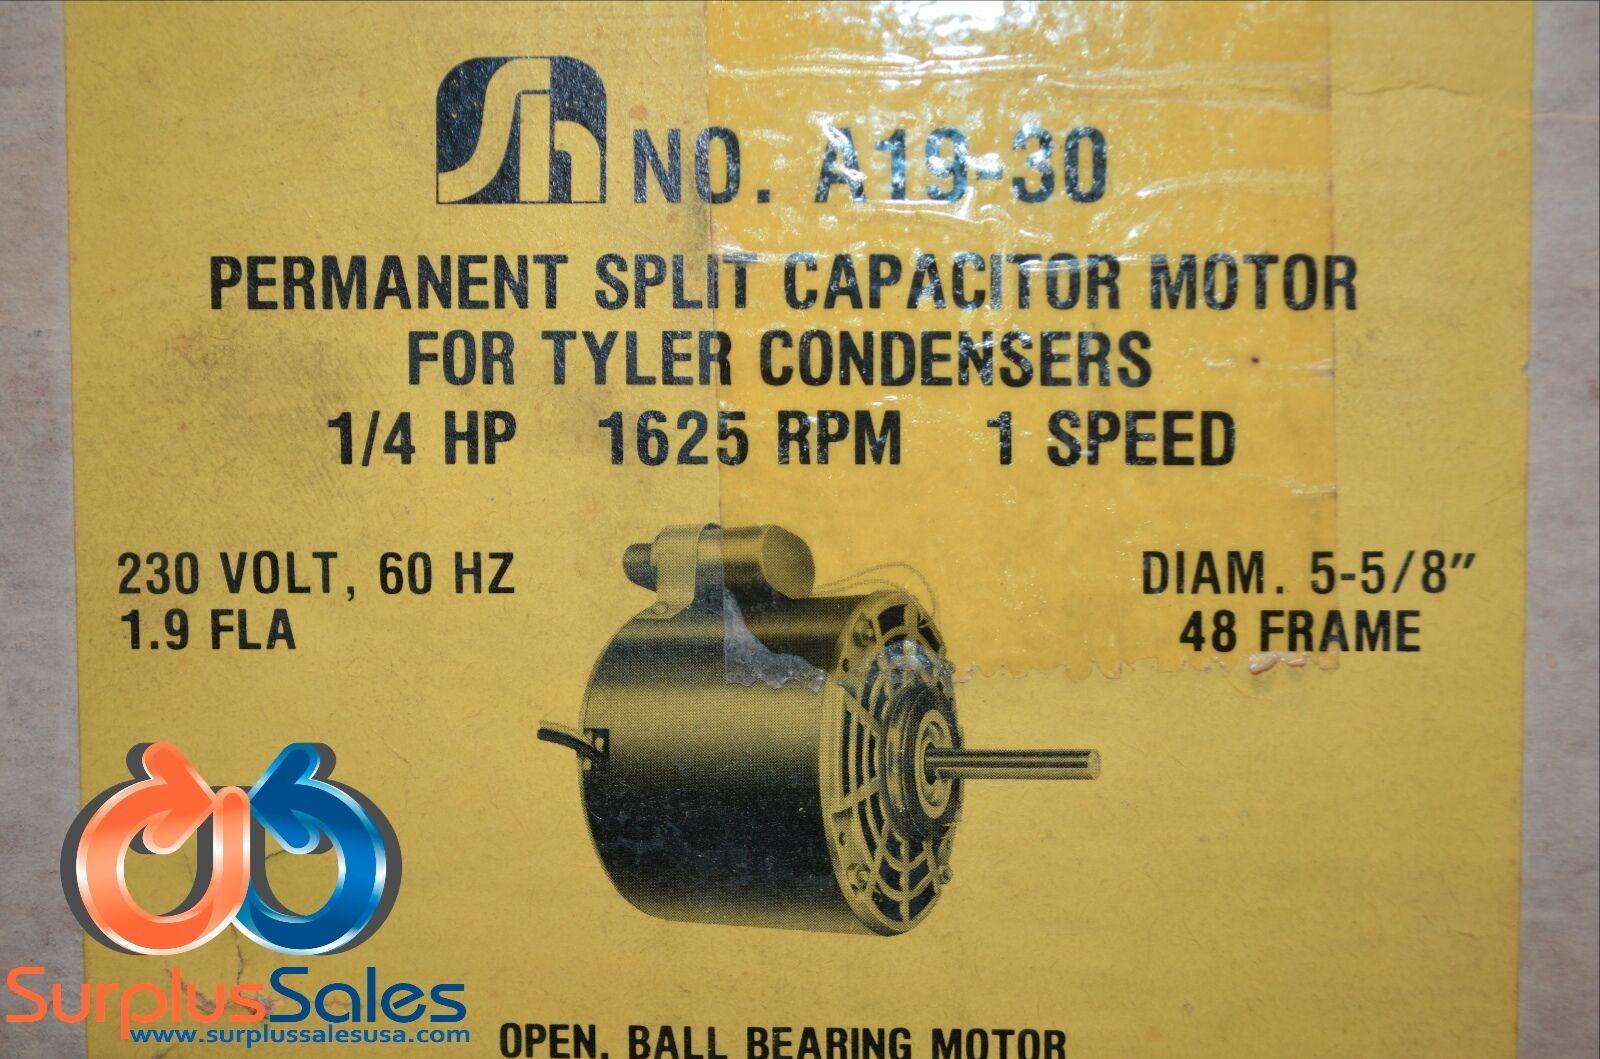 L1509t Baldor Capacitor Diagram Trusted Wiring Split Motor Sid Harveys 1 4 Hp 1625 Rpm Gt 48 Fr 230 V P 323p663 Motorcycle Ignition